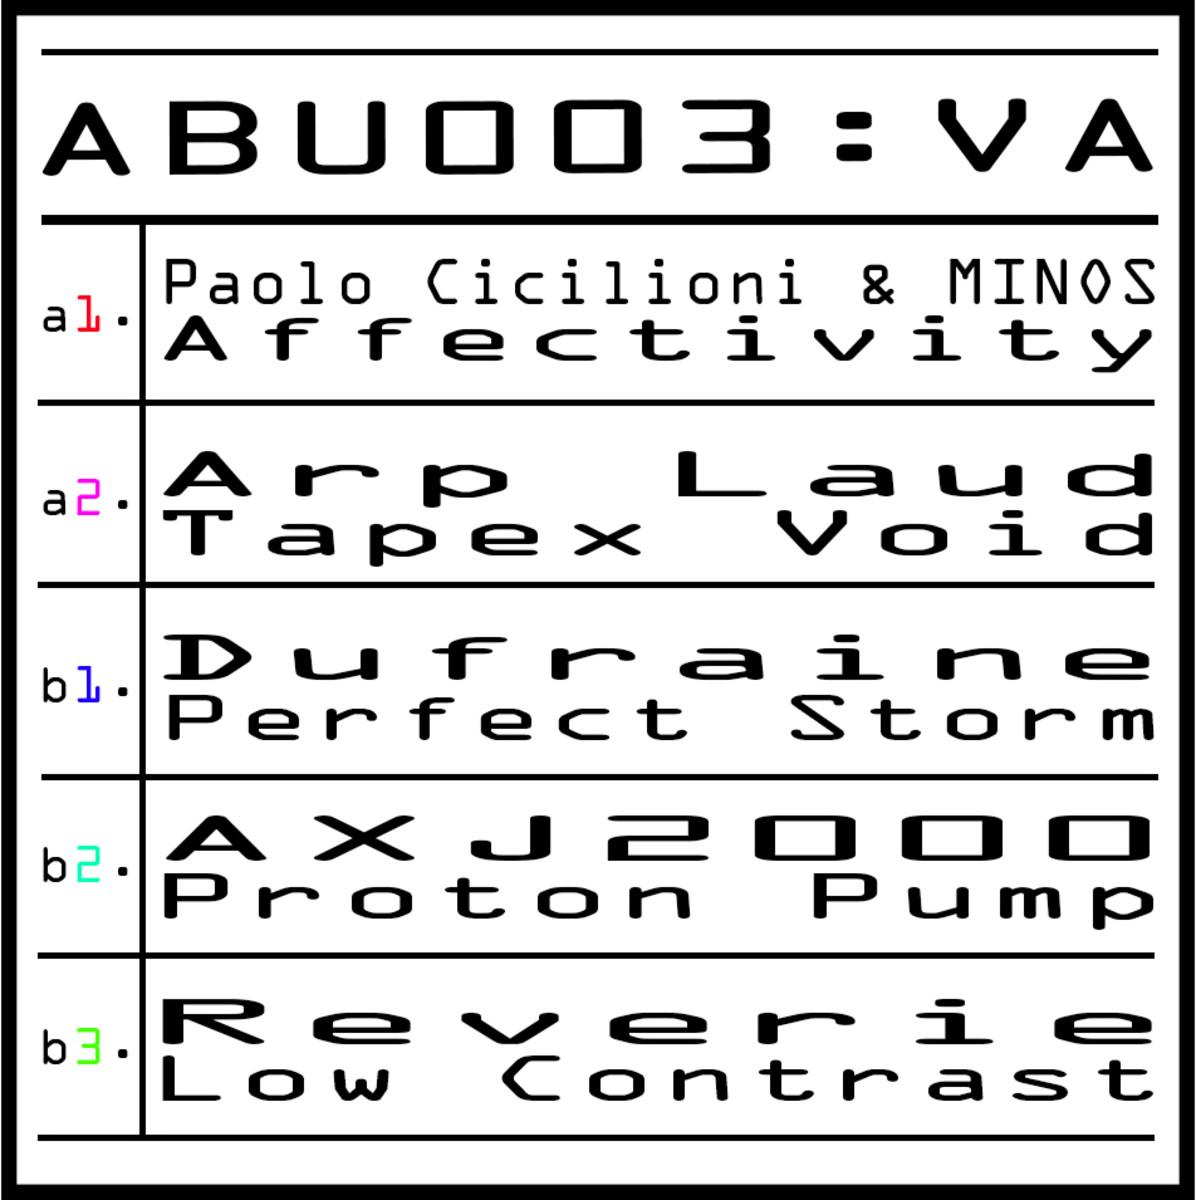 ABU003: VA